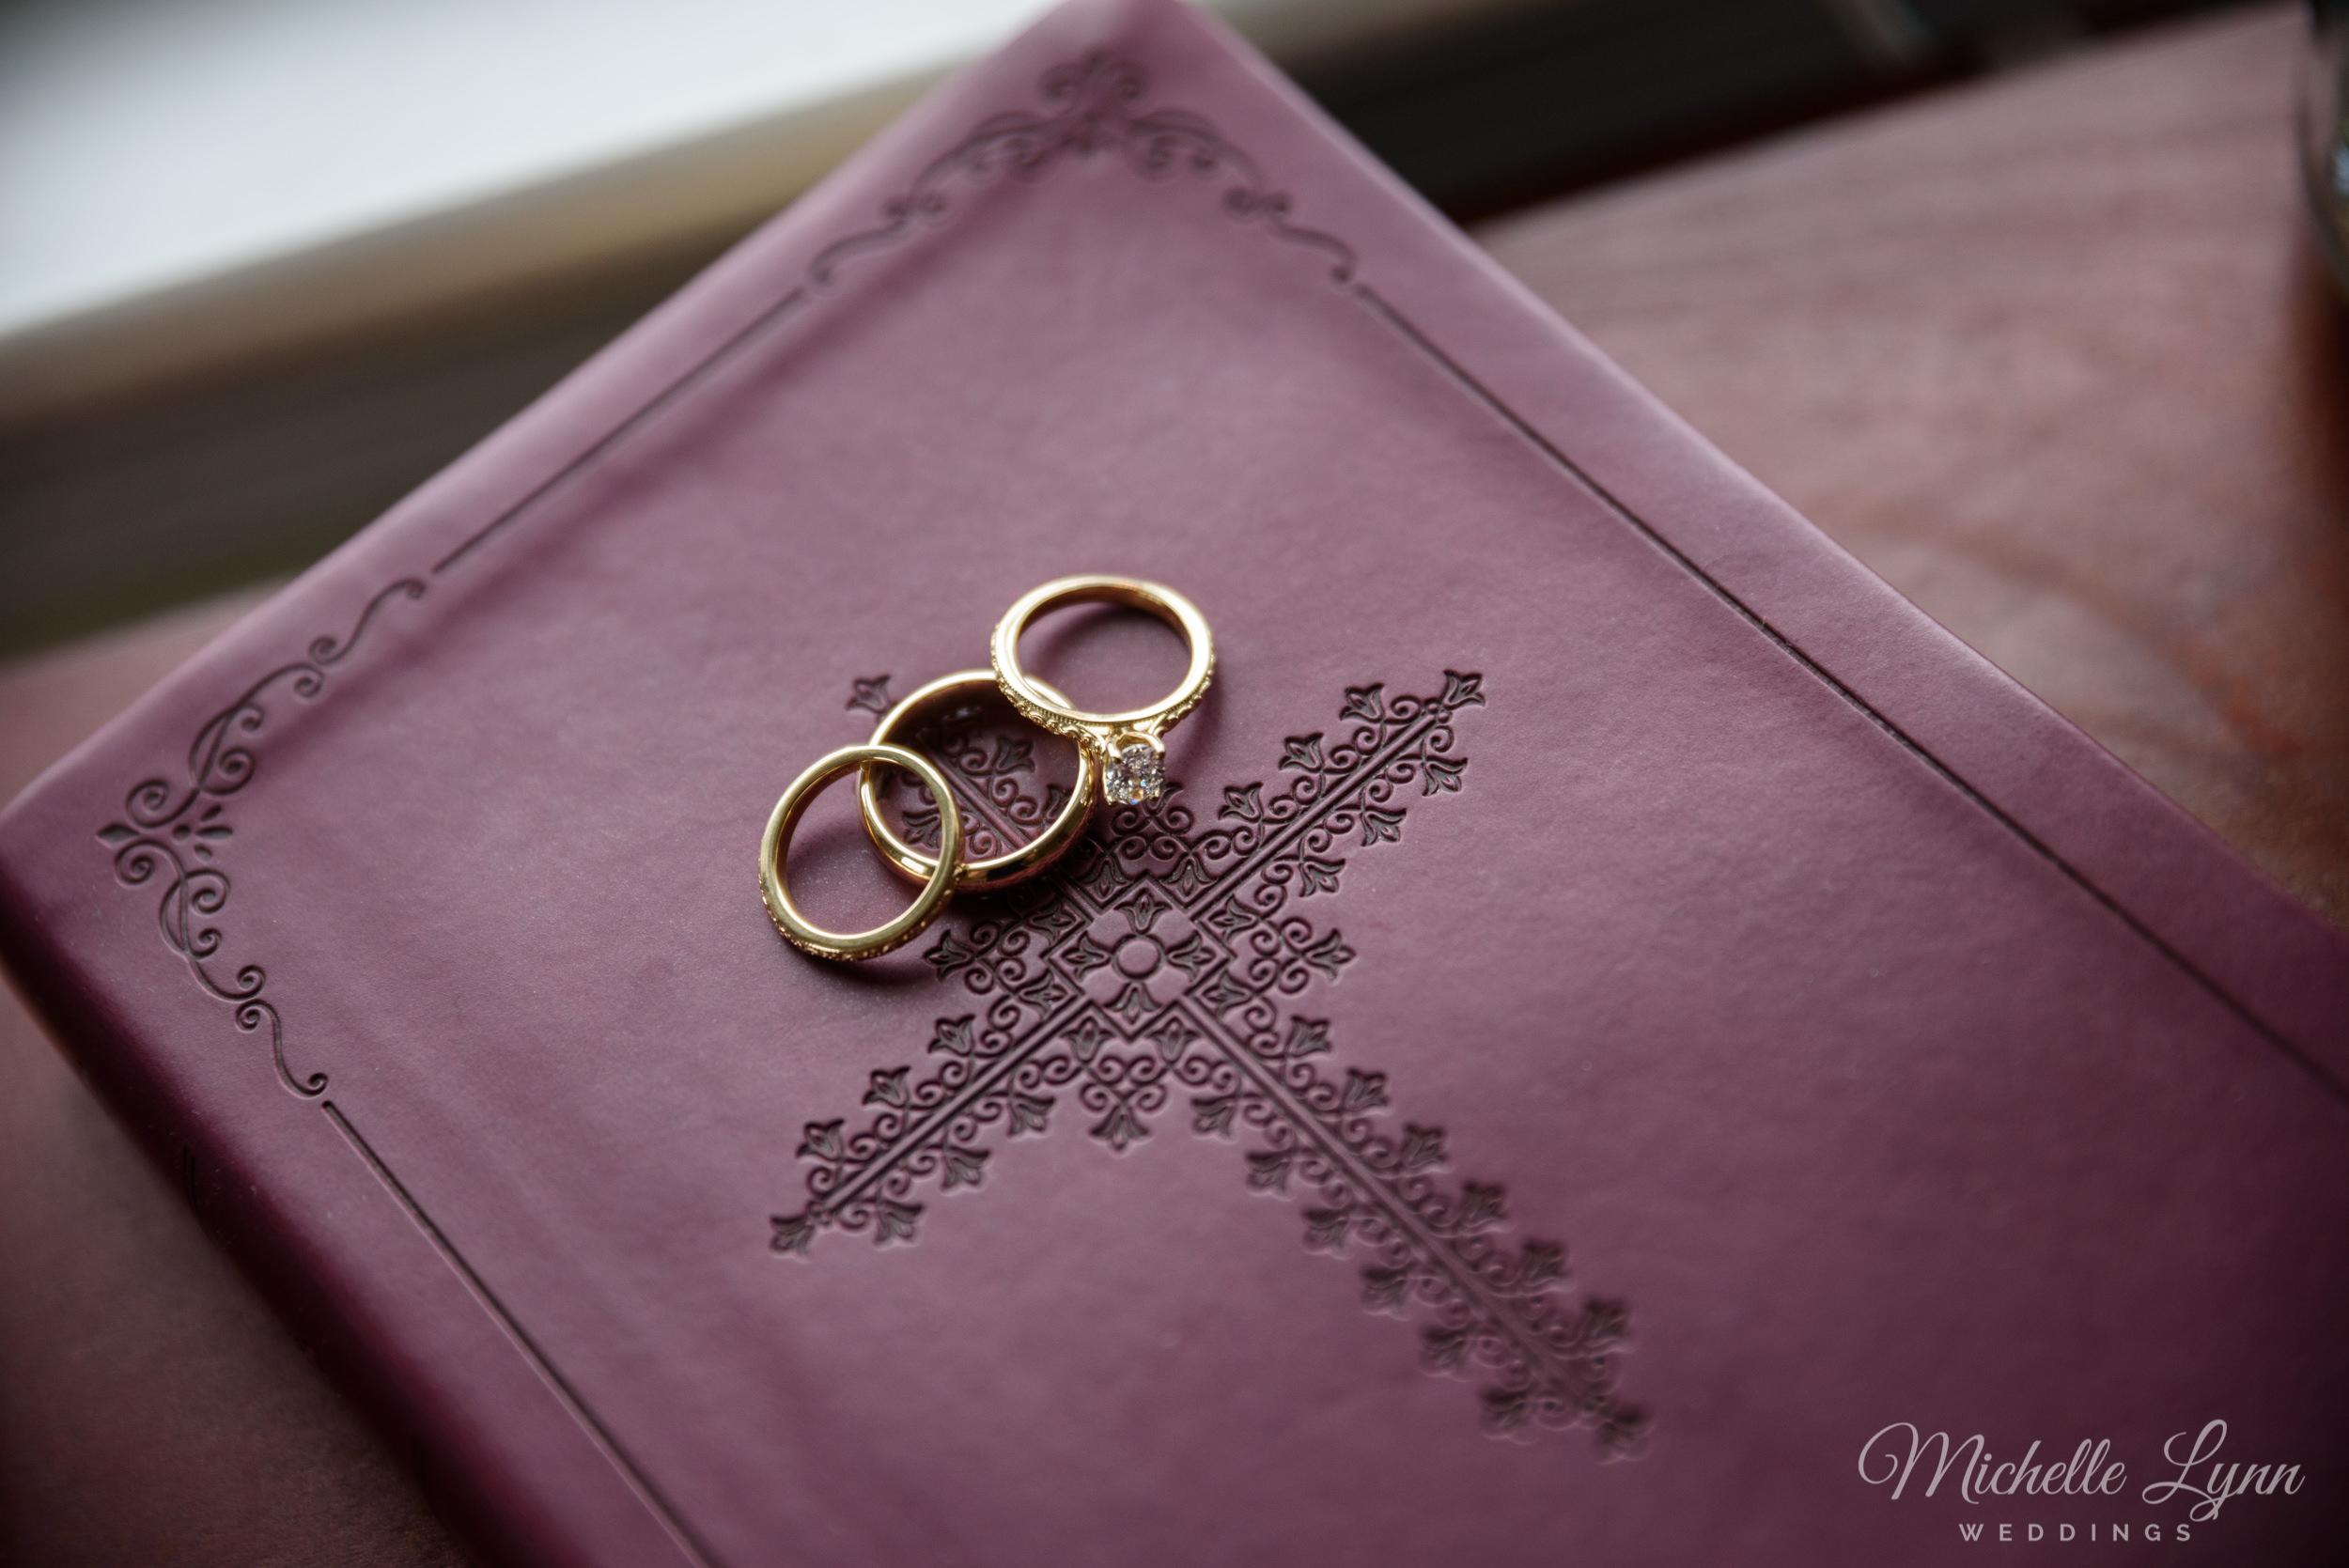 william-penn-inn-wedding-photography-mlw-6.jpg